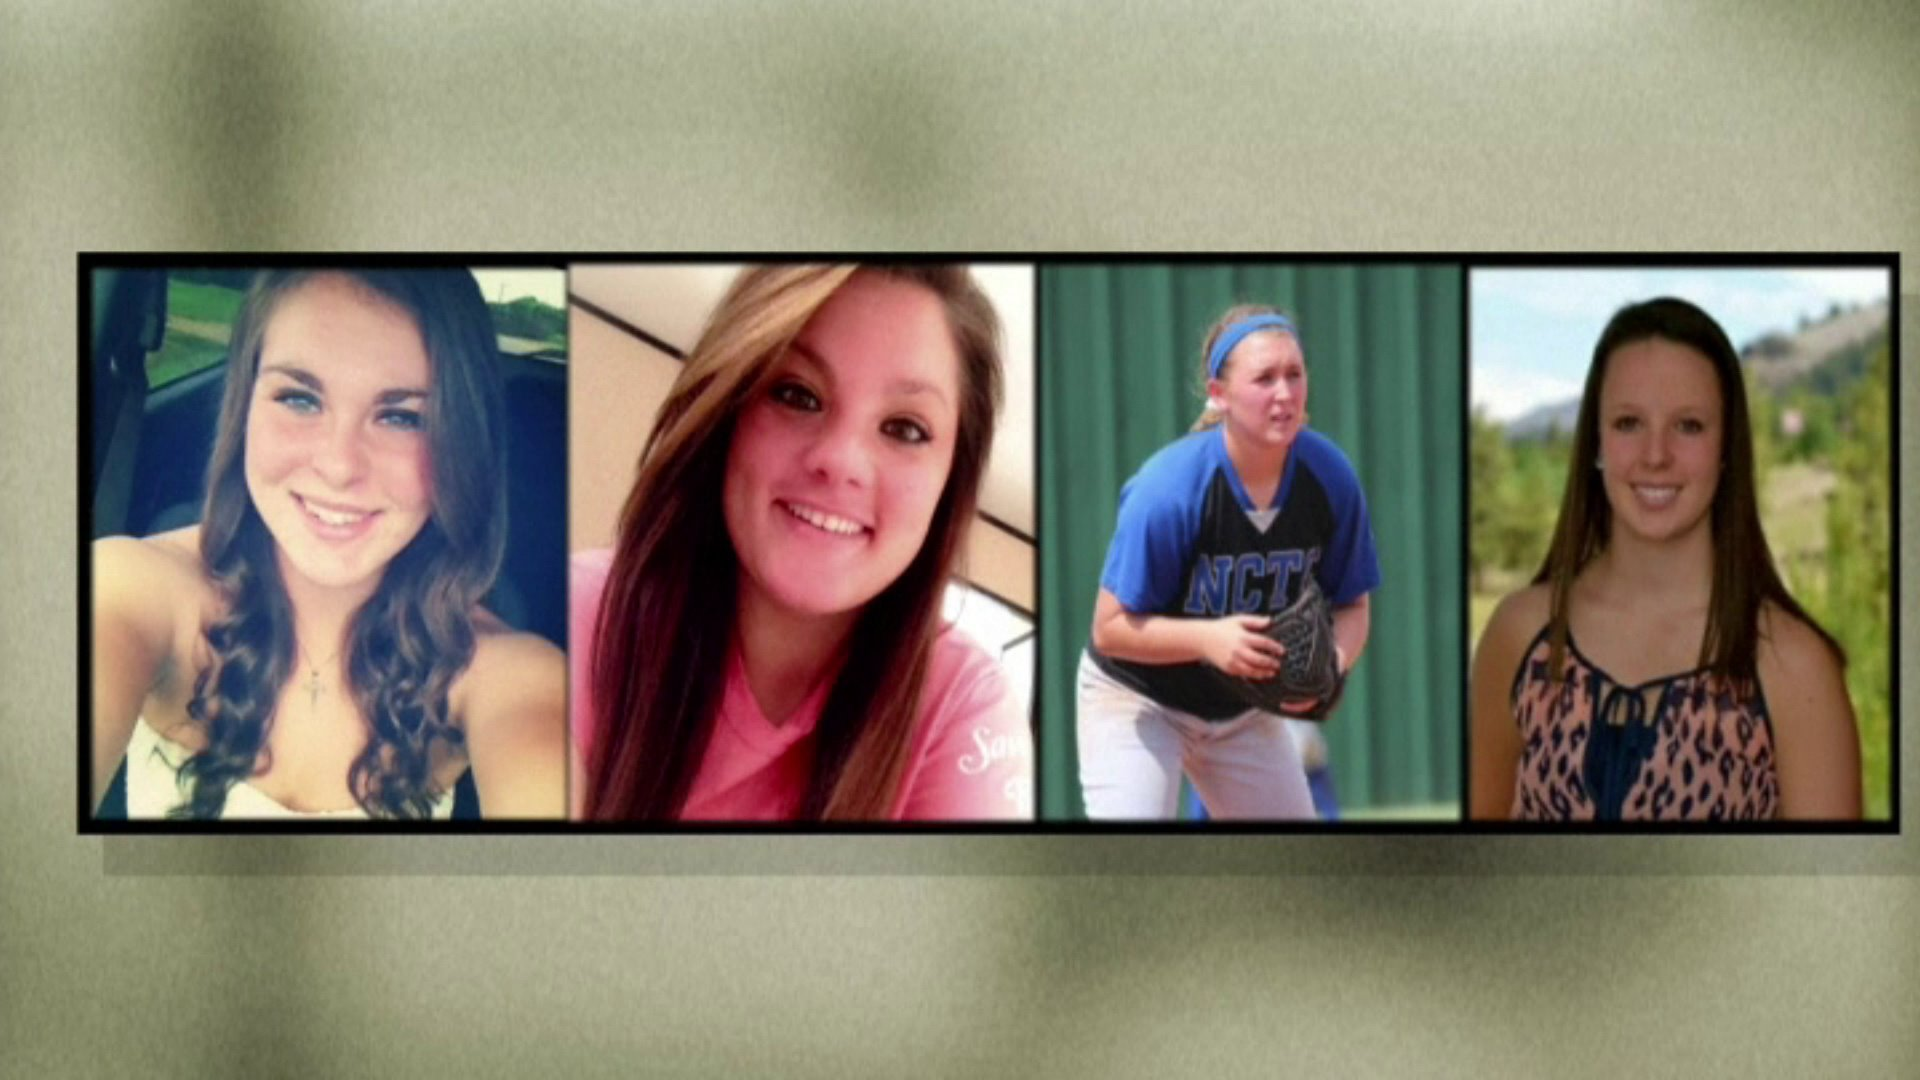 Jaiden Pelton, 20, Brooke Deckard, 20, Katelynn Woodlee, 18, and Megan Richardson, 19, were all killed in the crash.